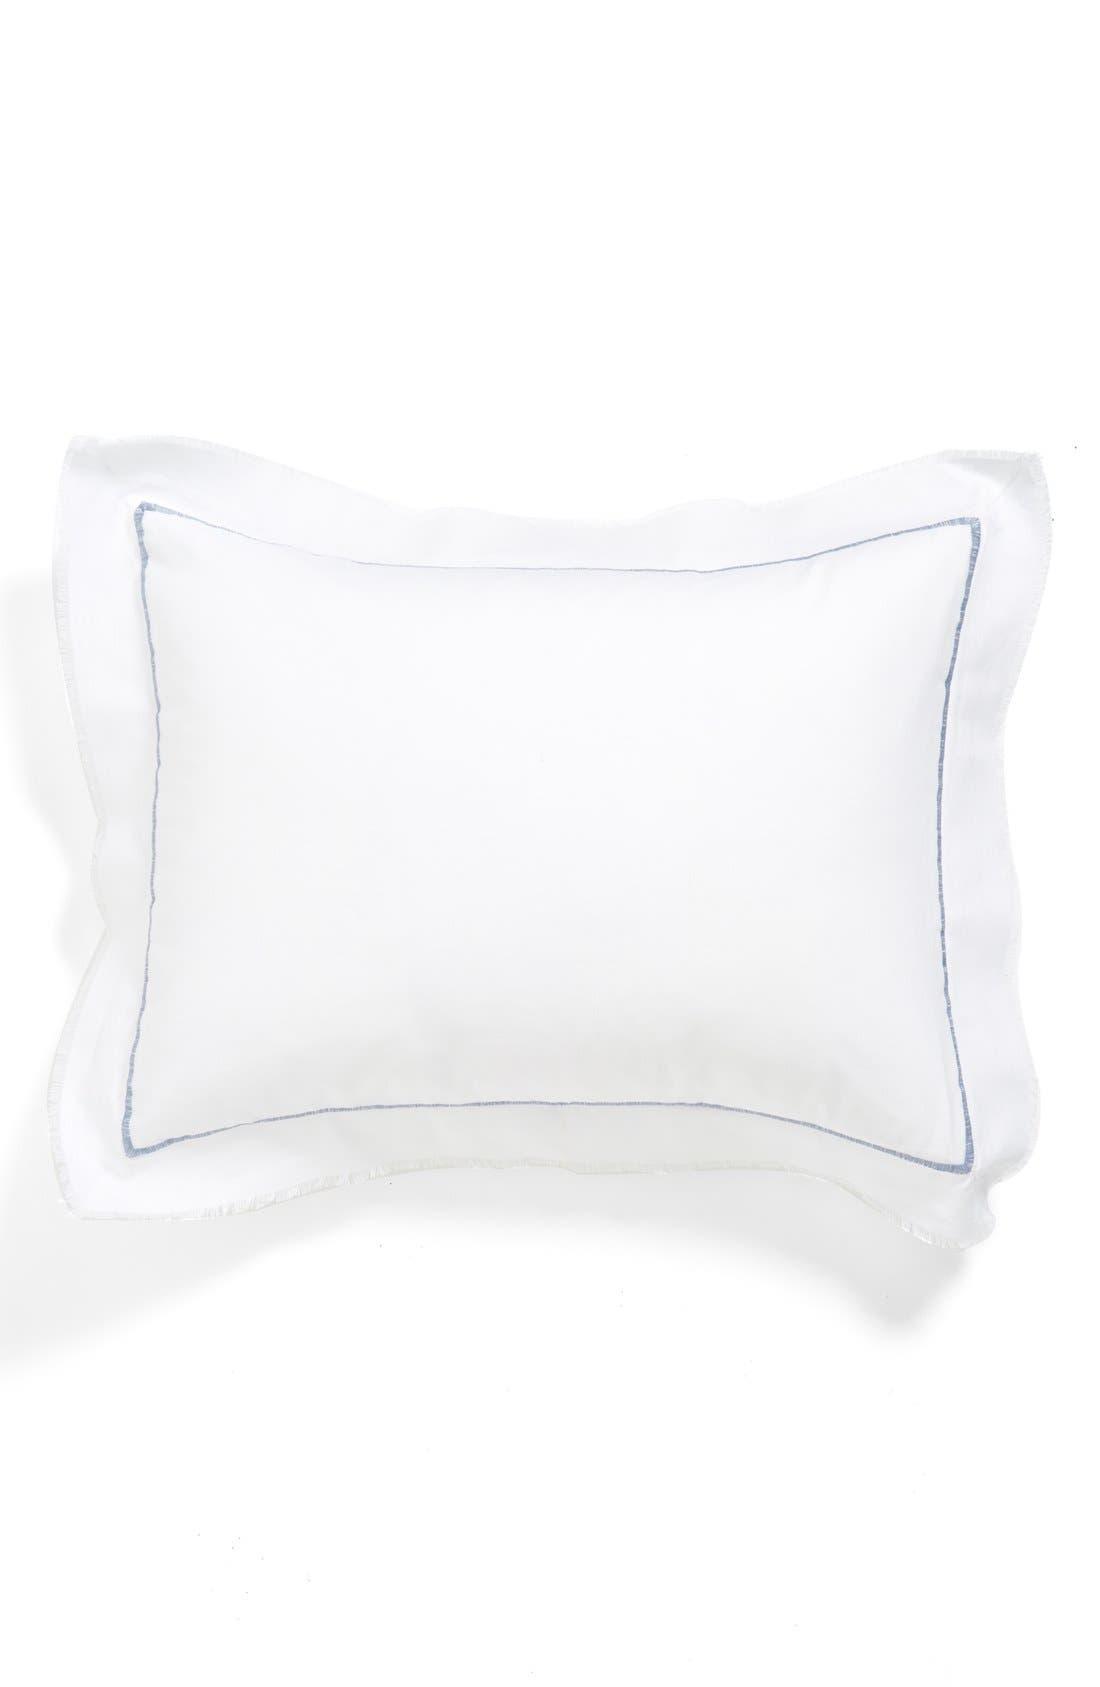 Main Image - Vera Wang 'Scrolls' Pillow